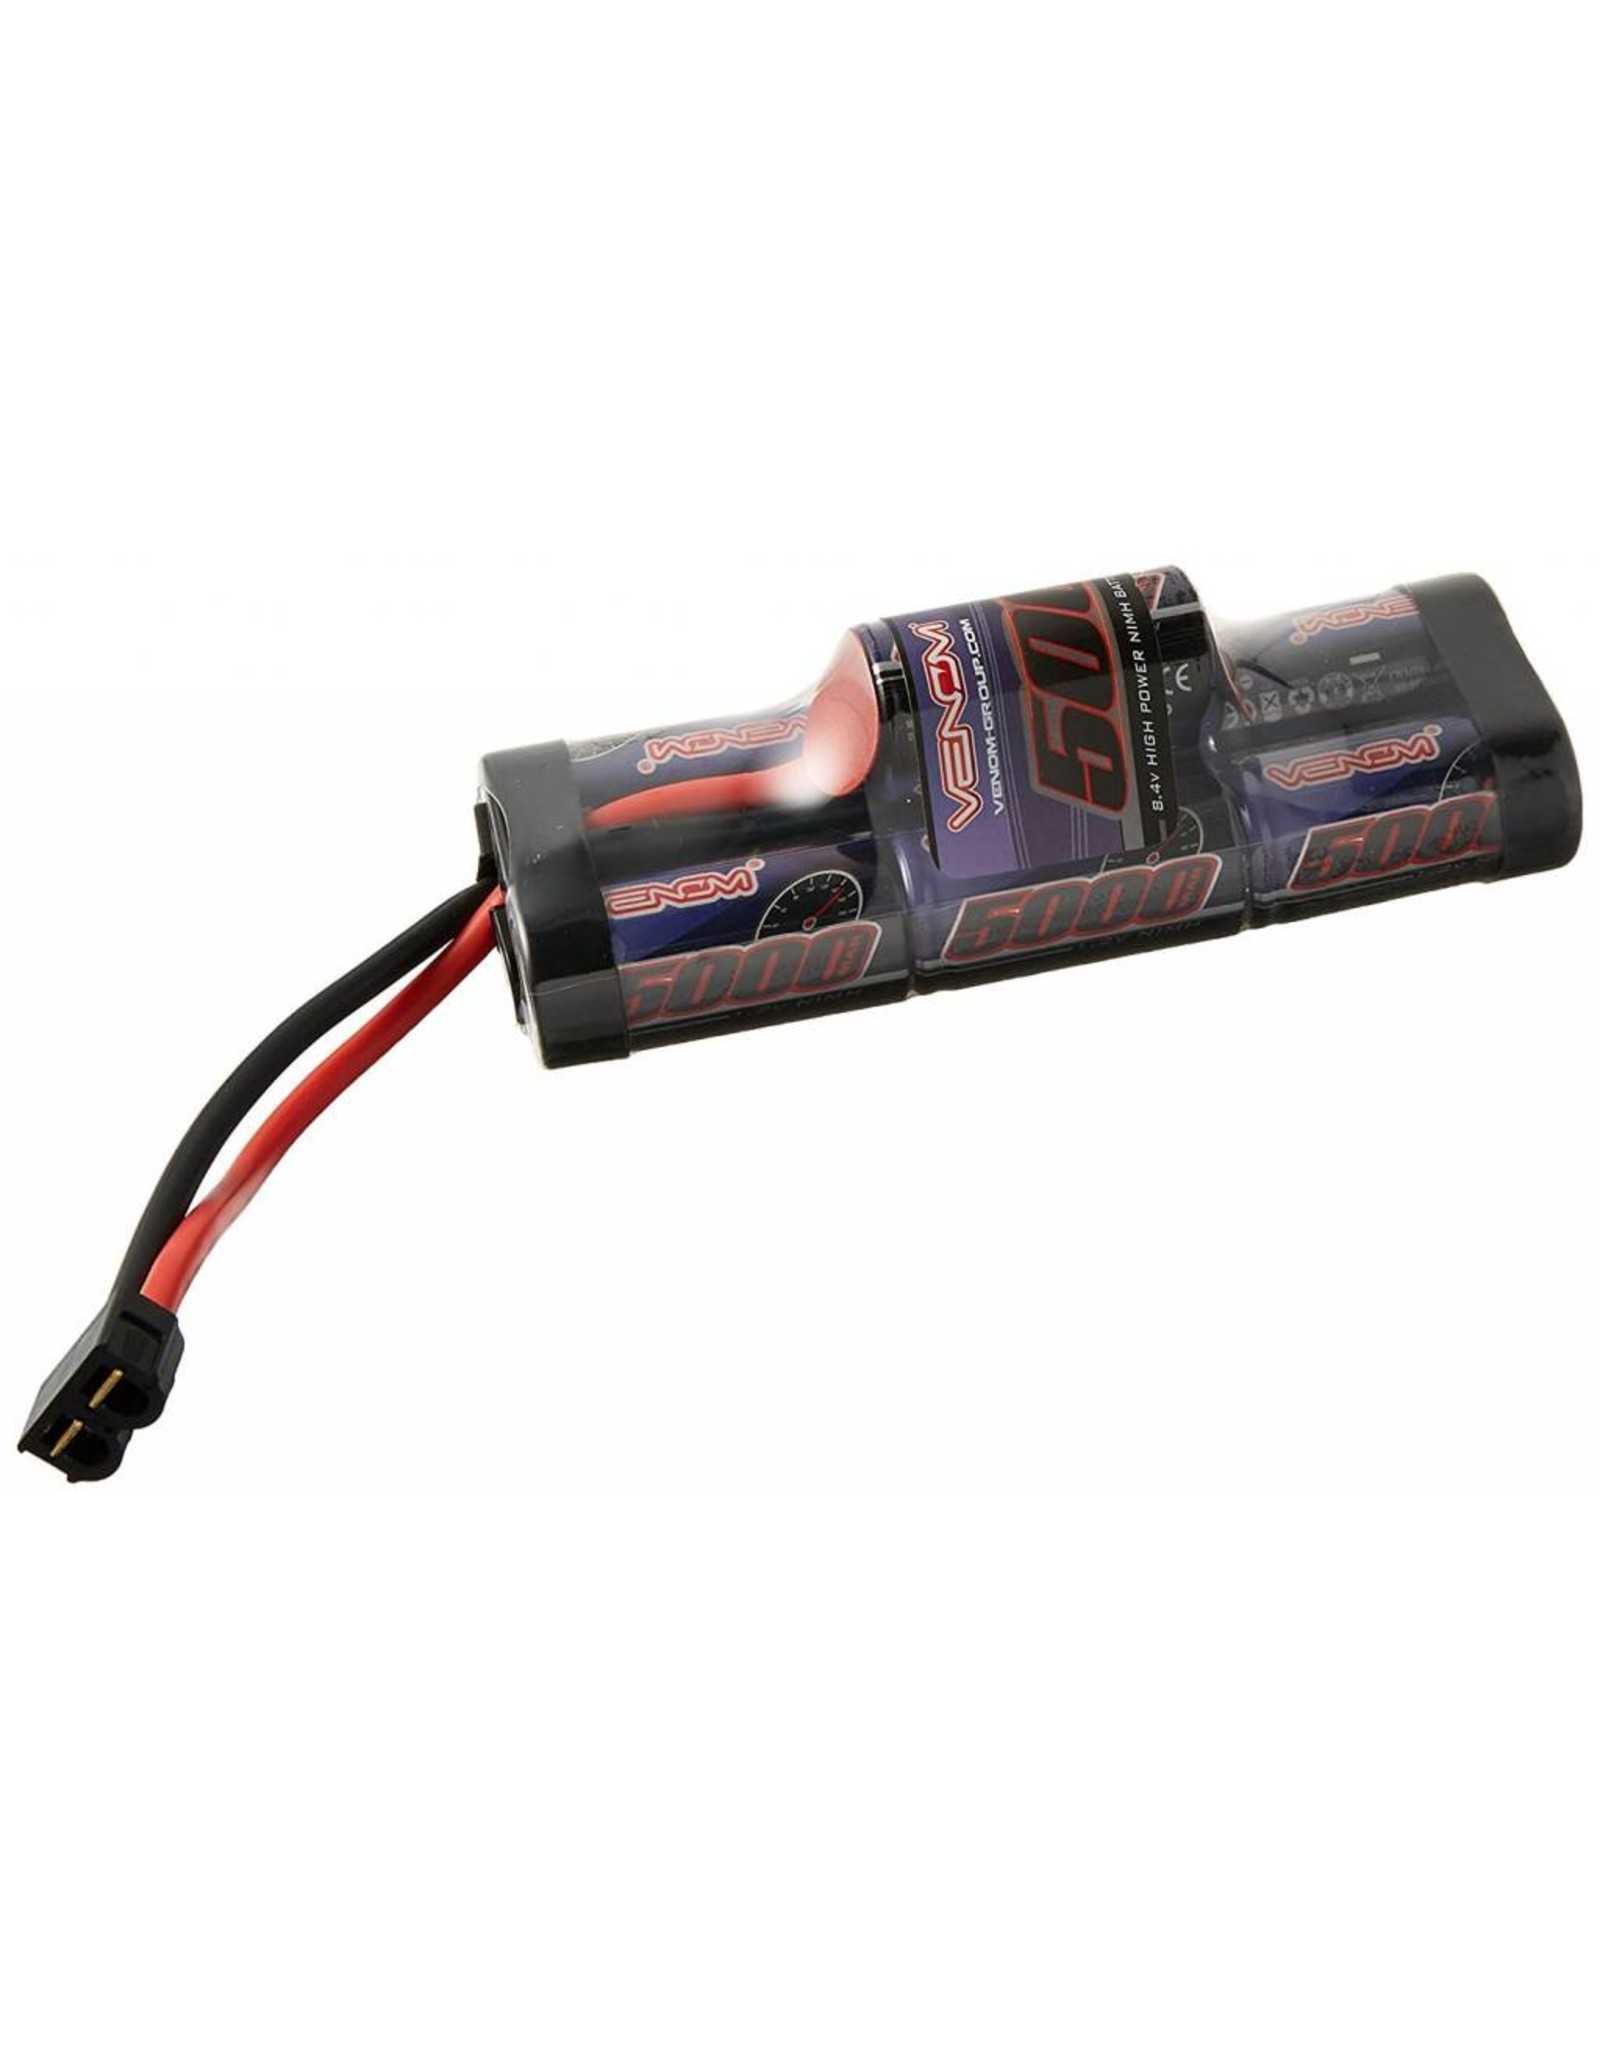 Venom Power 7-Cell 8.4V 5000mAh NiMH Hump Pack Battery: UNI 2.0 Plug (VNR1548-7)